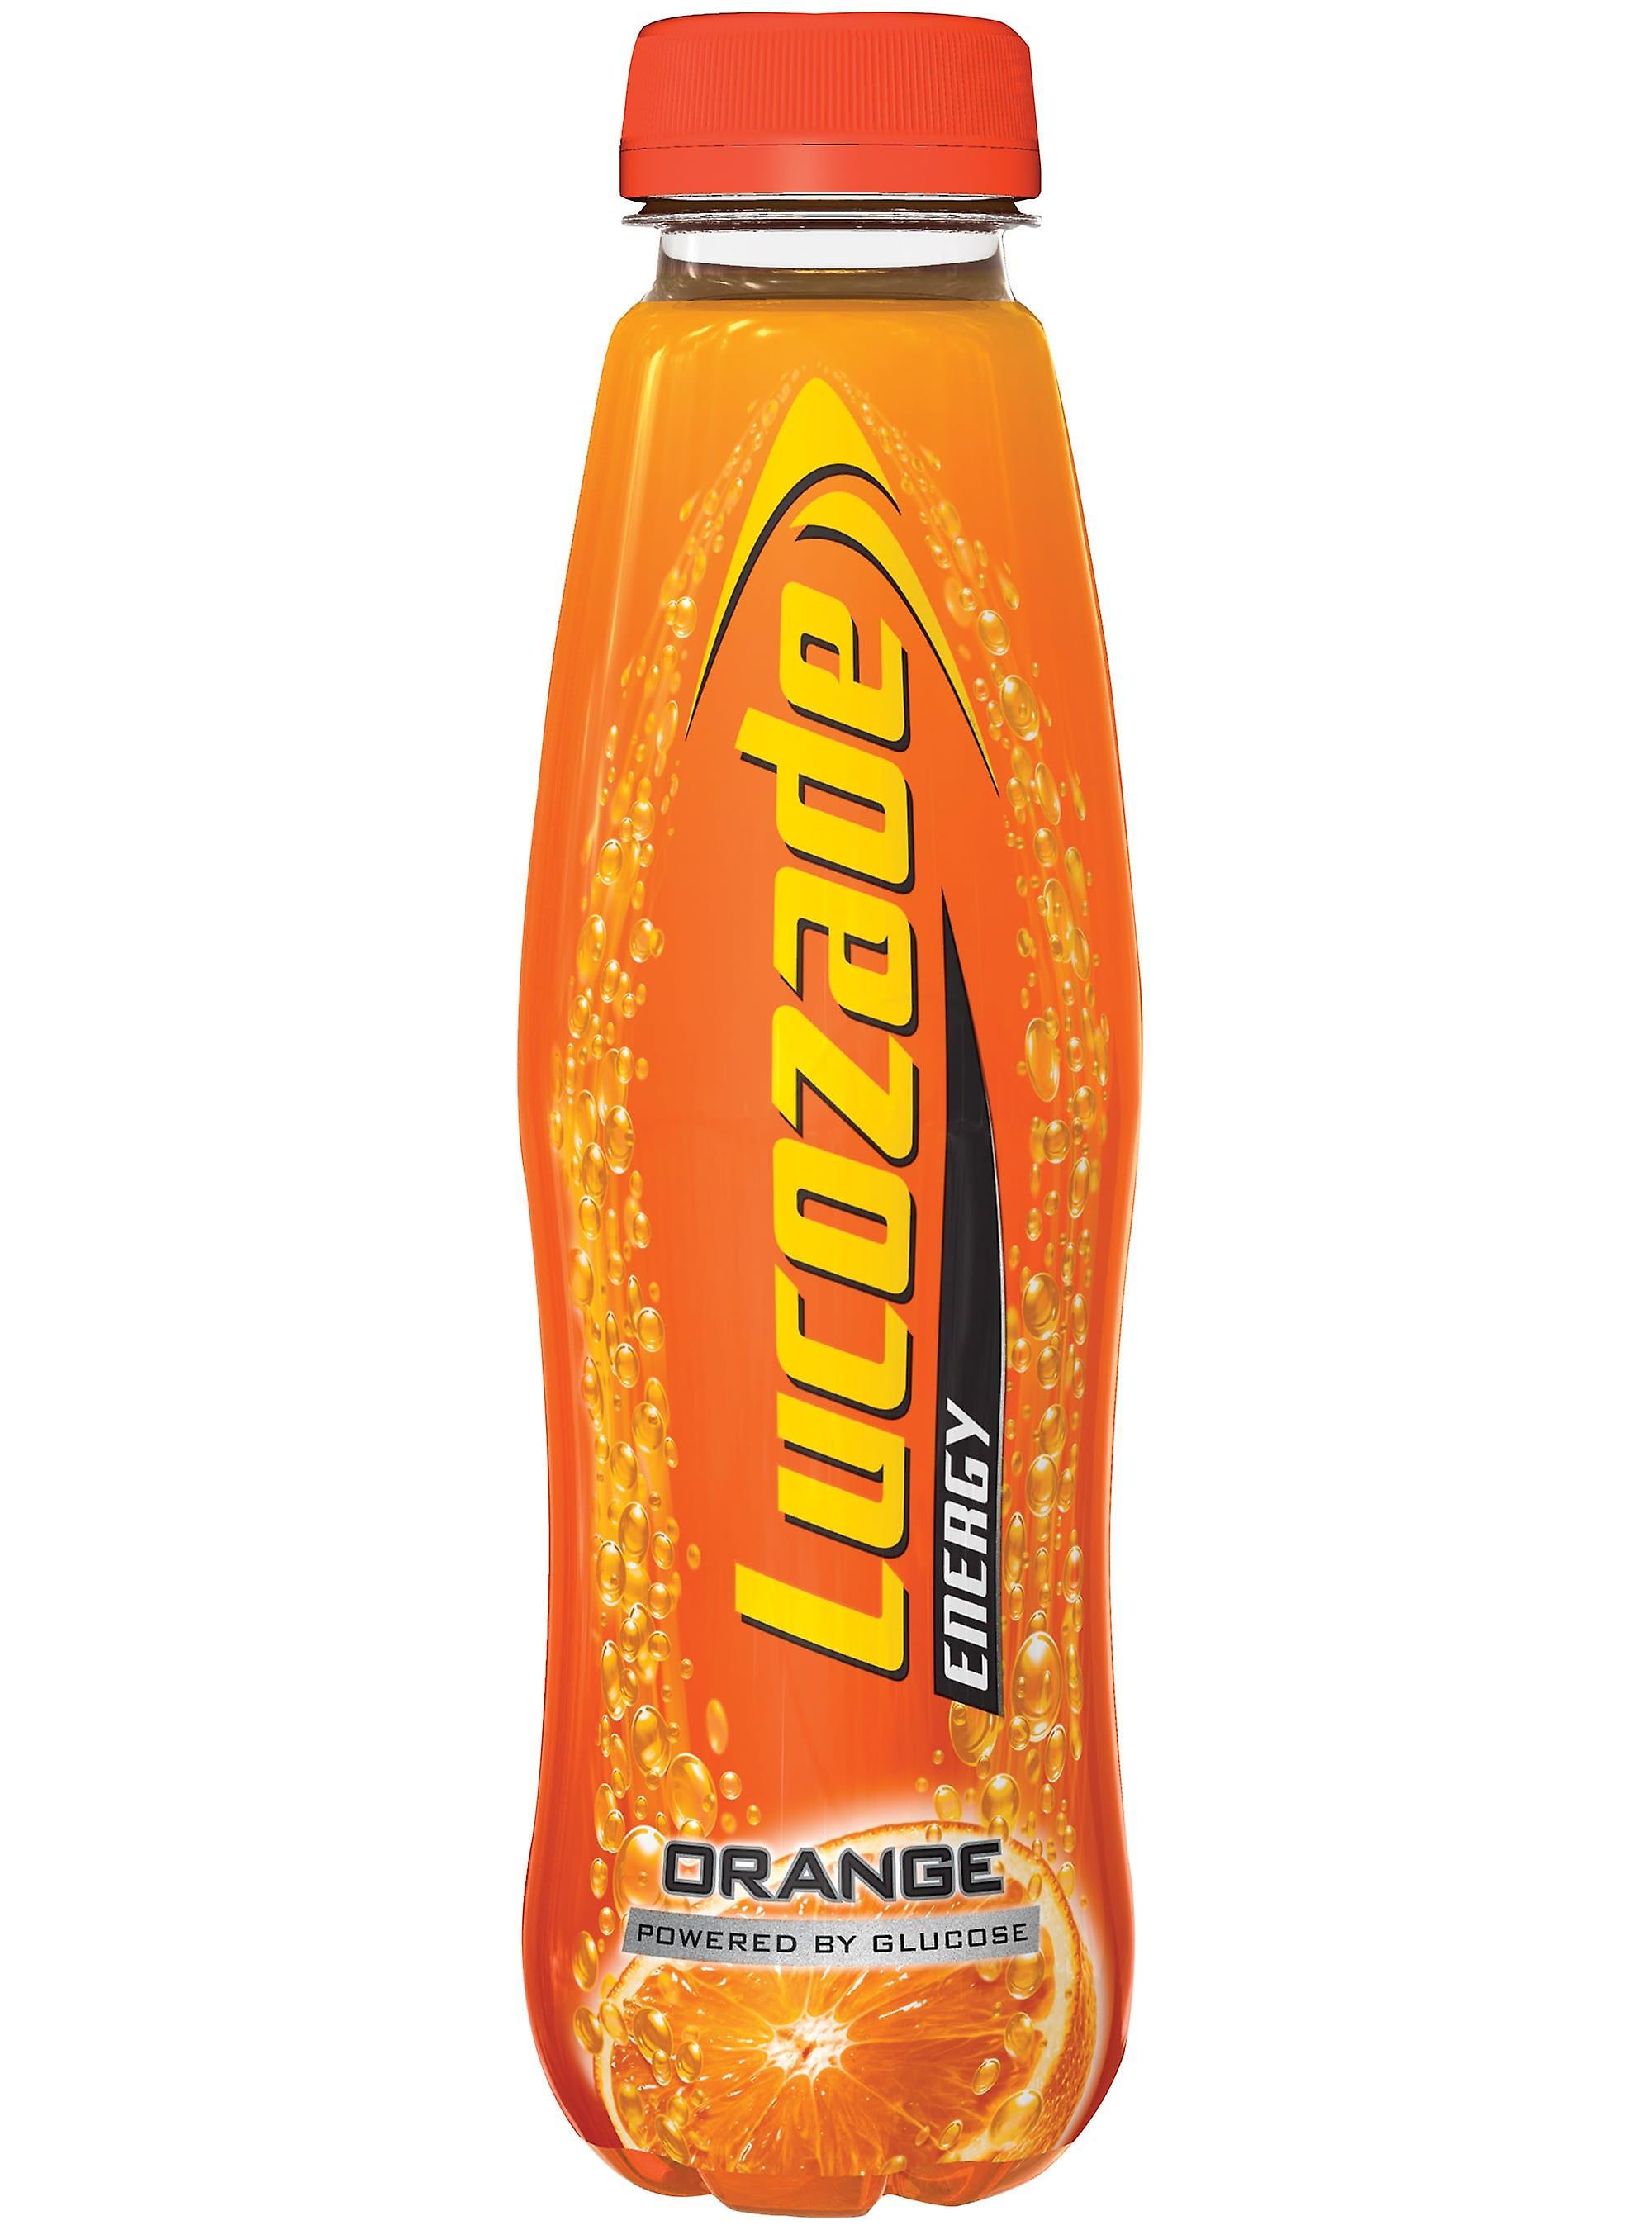 Lucozade Orange Energy Drink